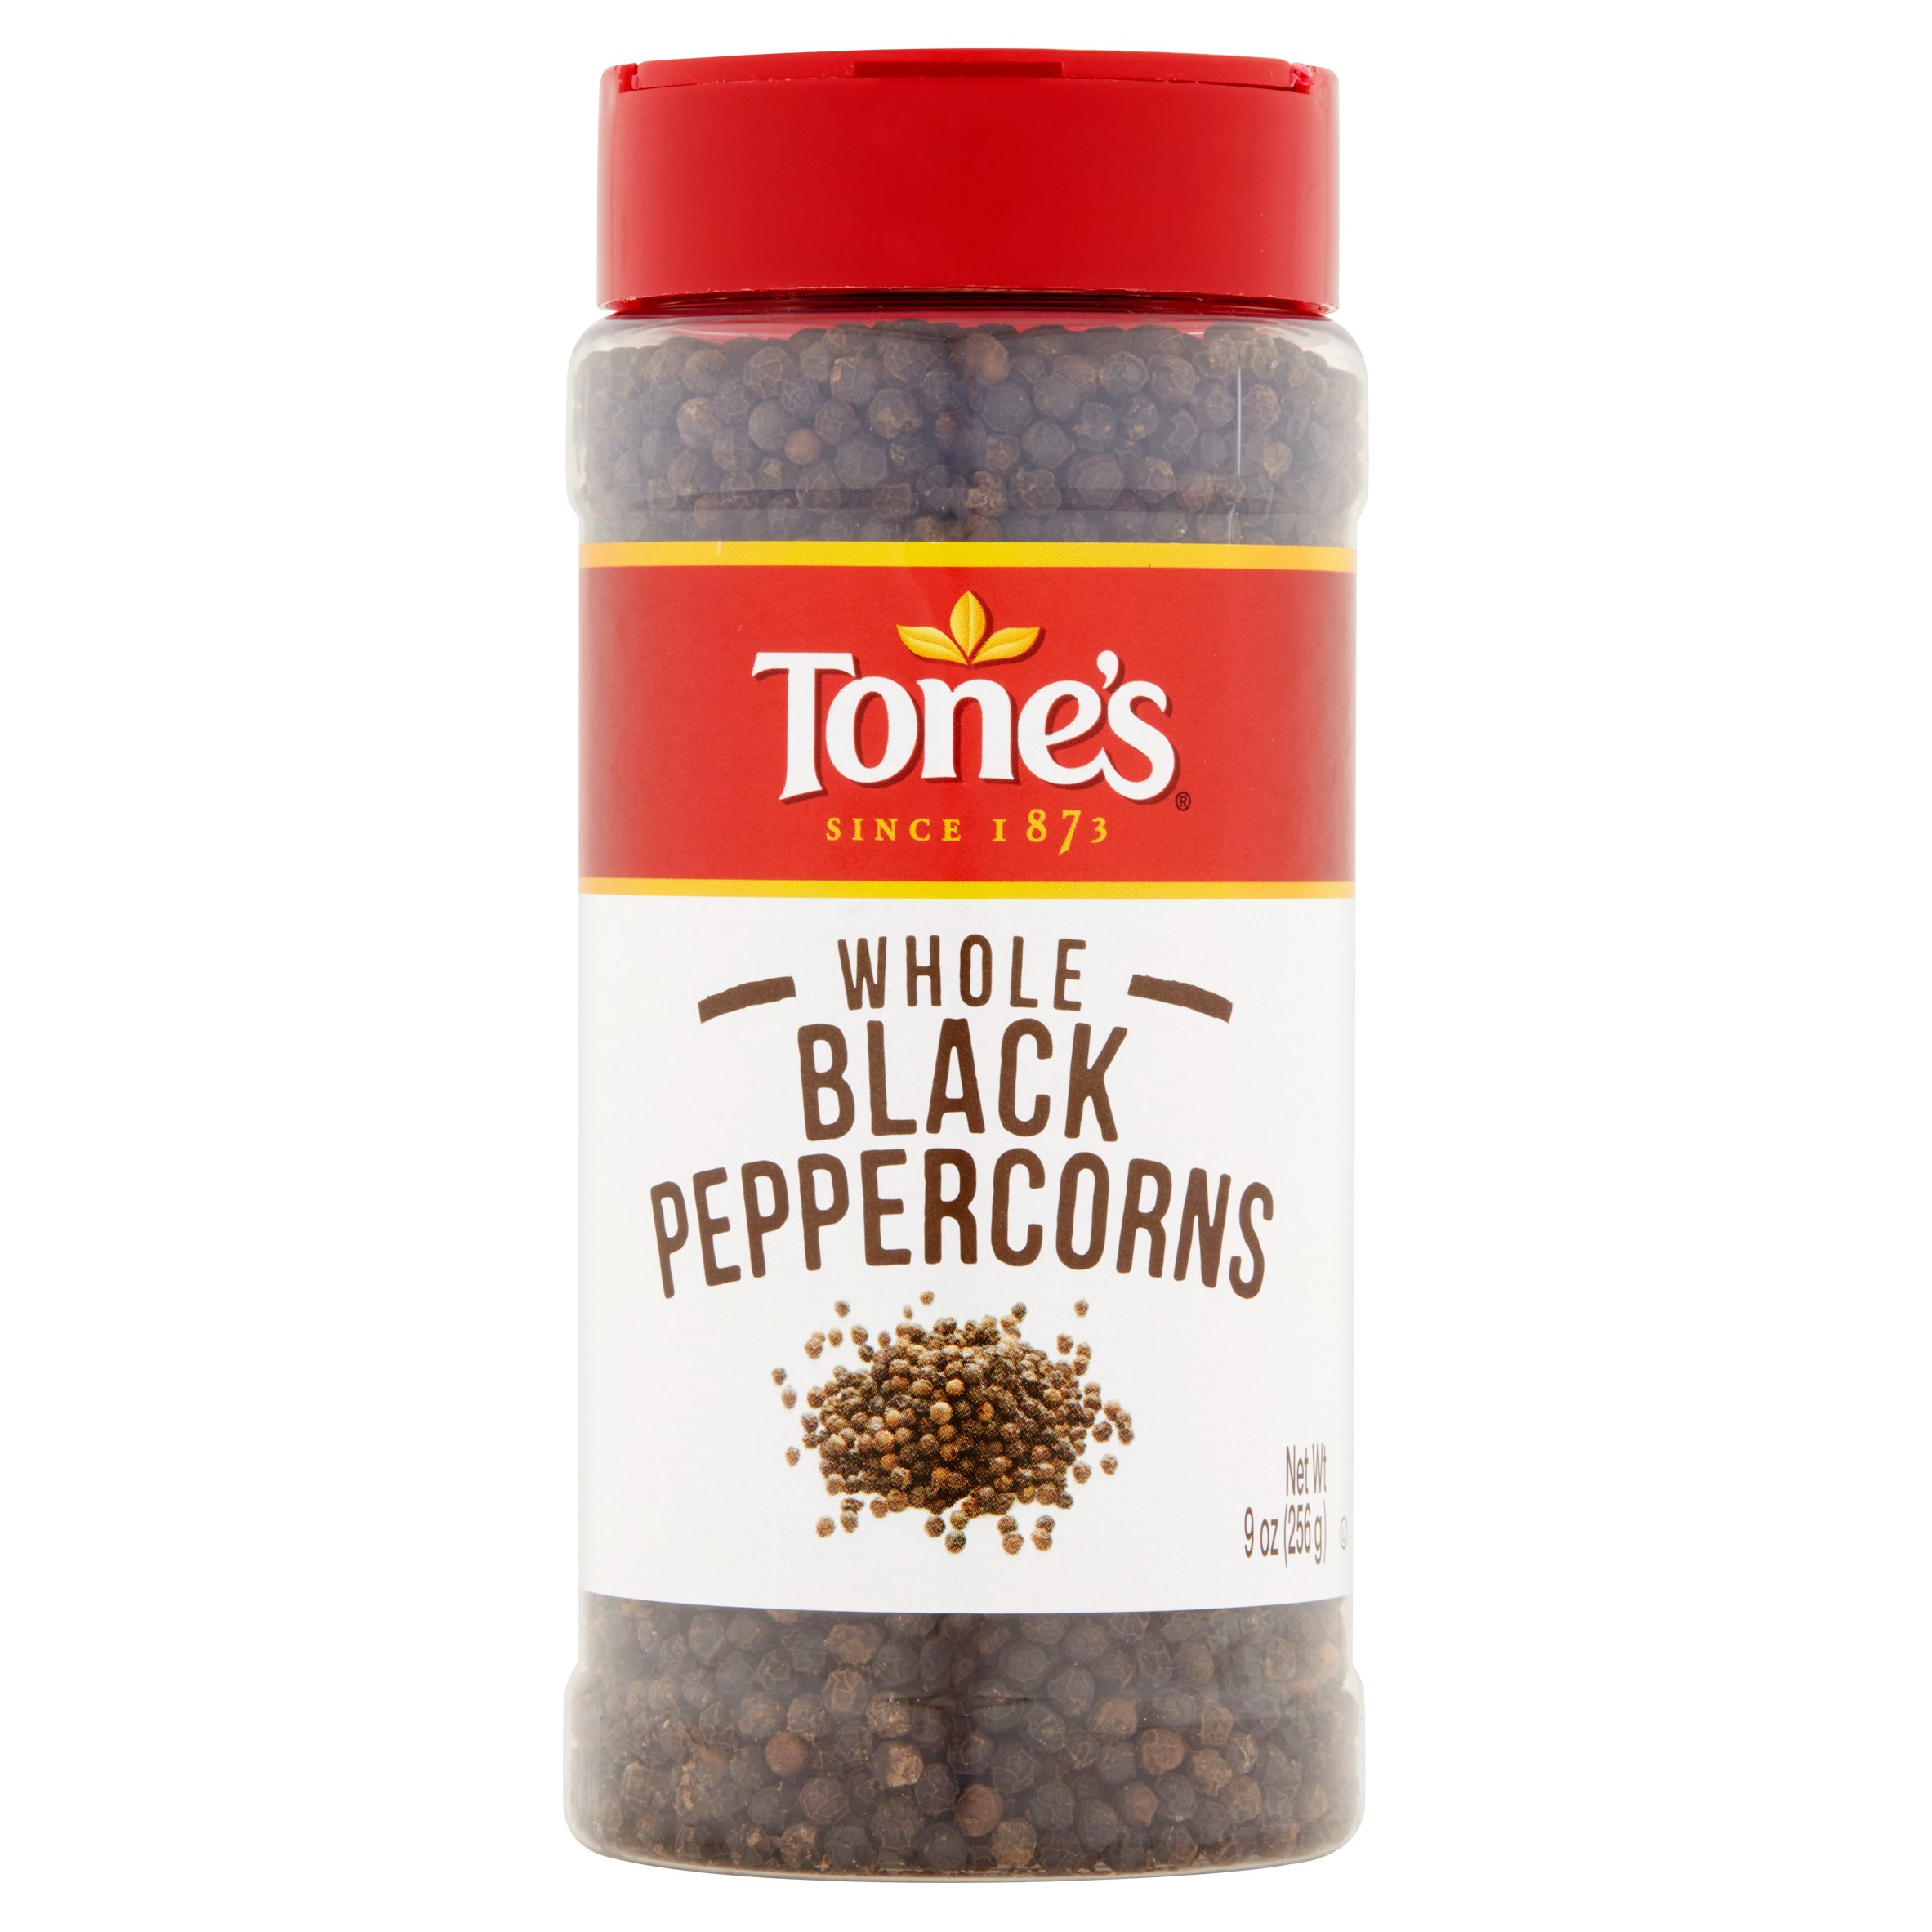 Tones Whole Black Peppercorns, 9 oz